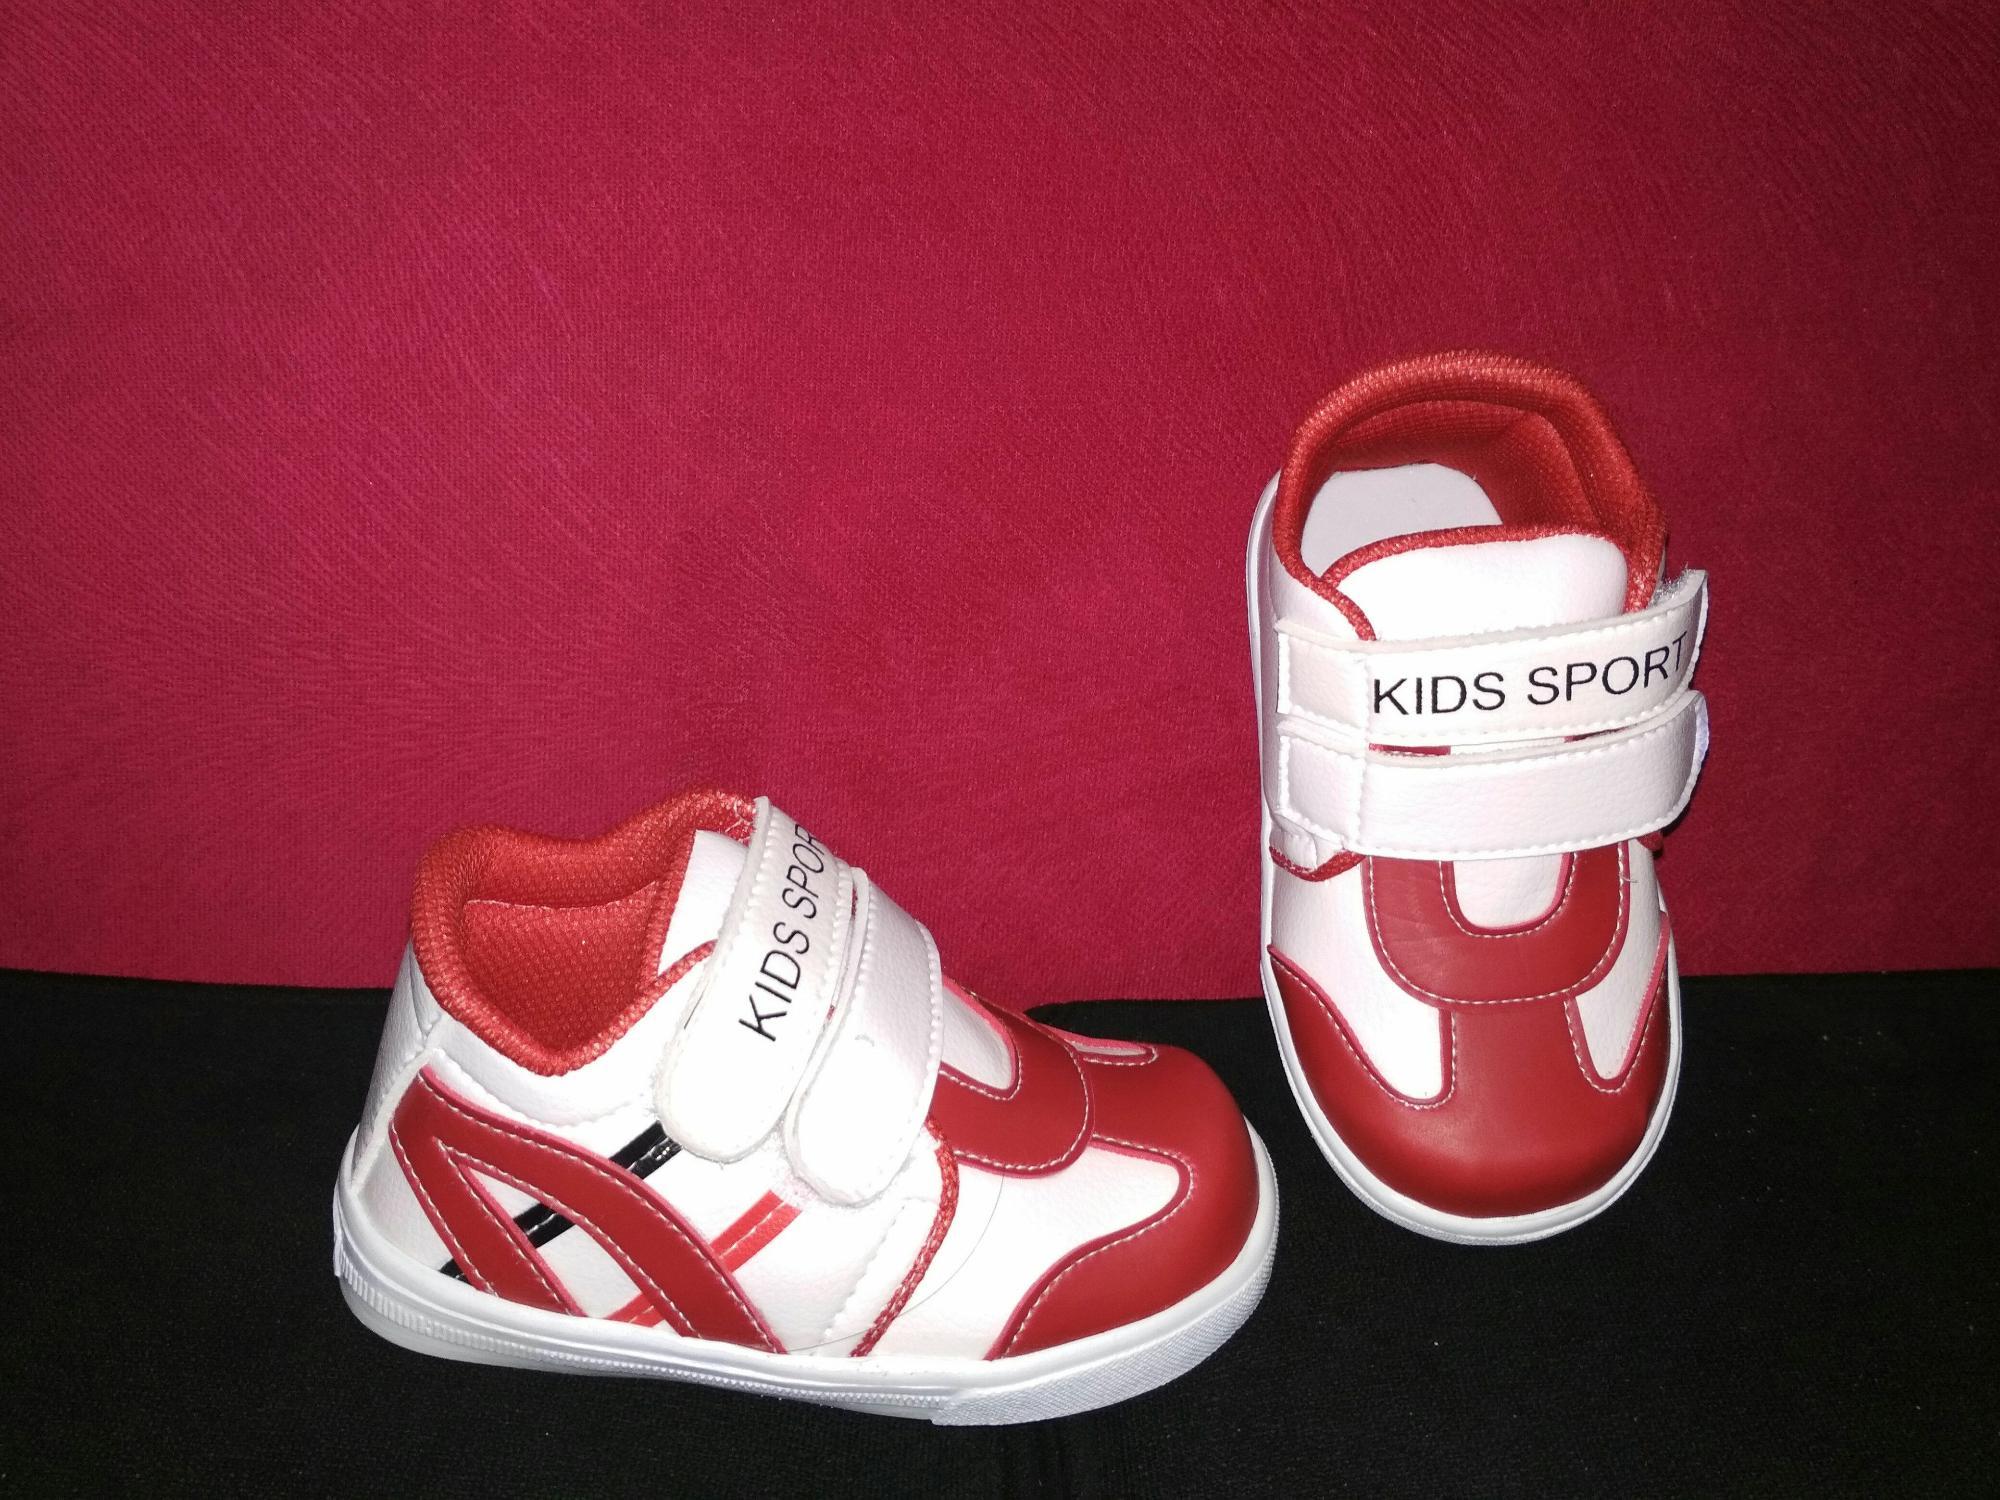 Grosir Sepatu Kids Sport